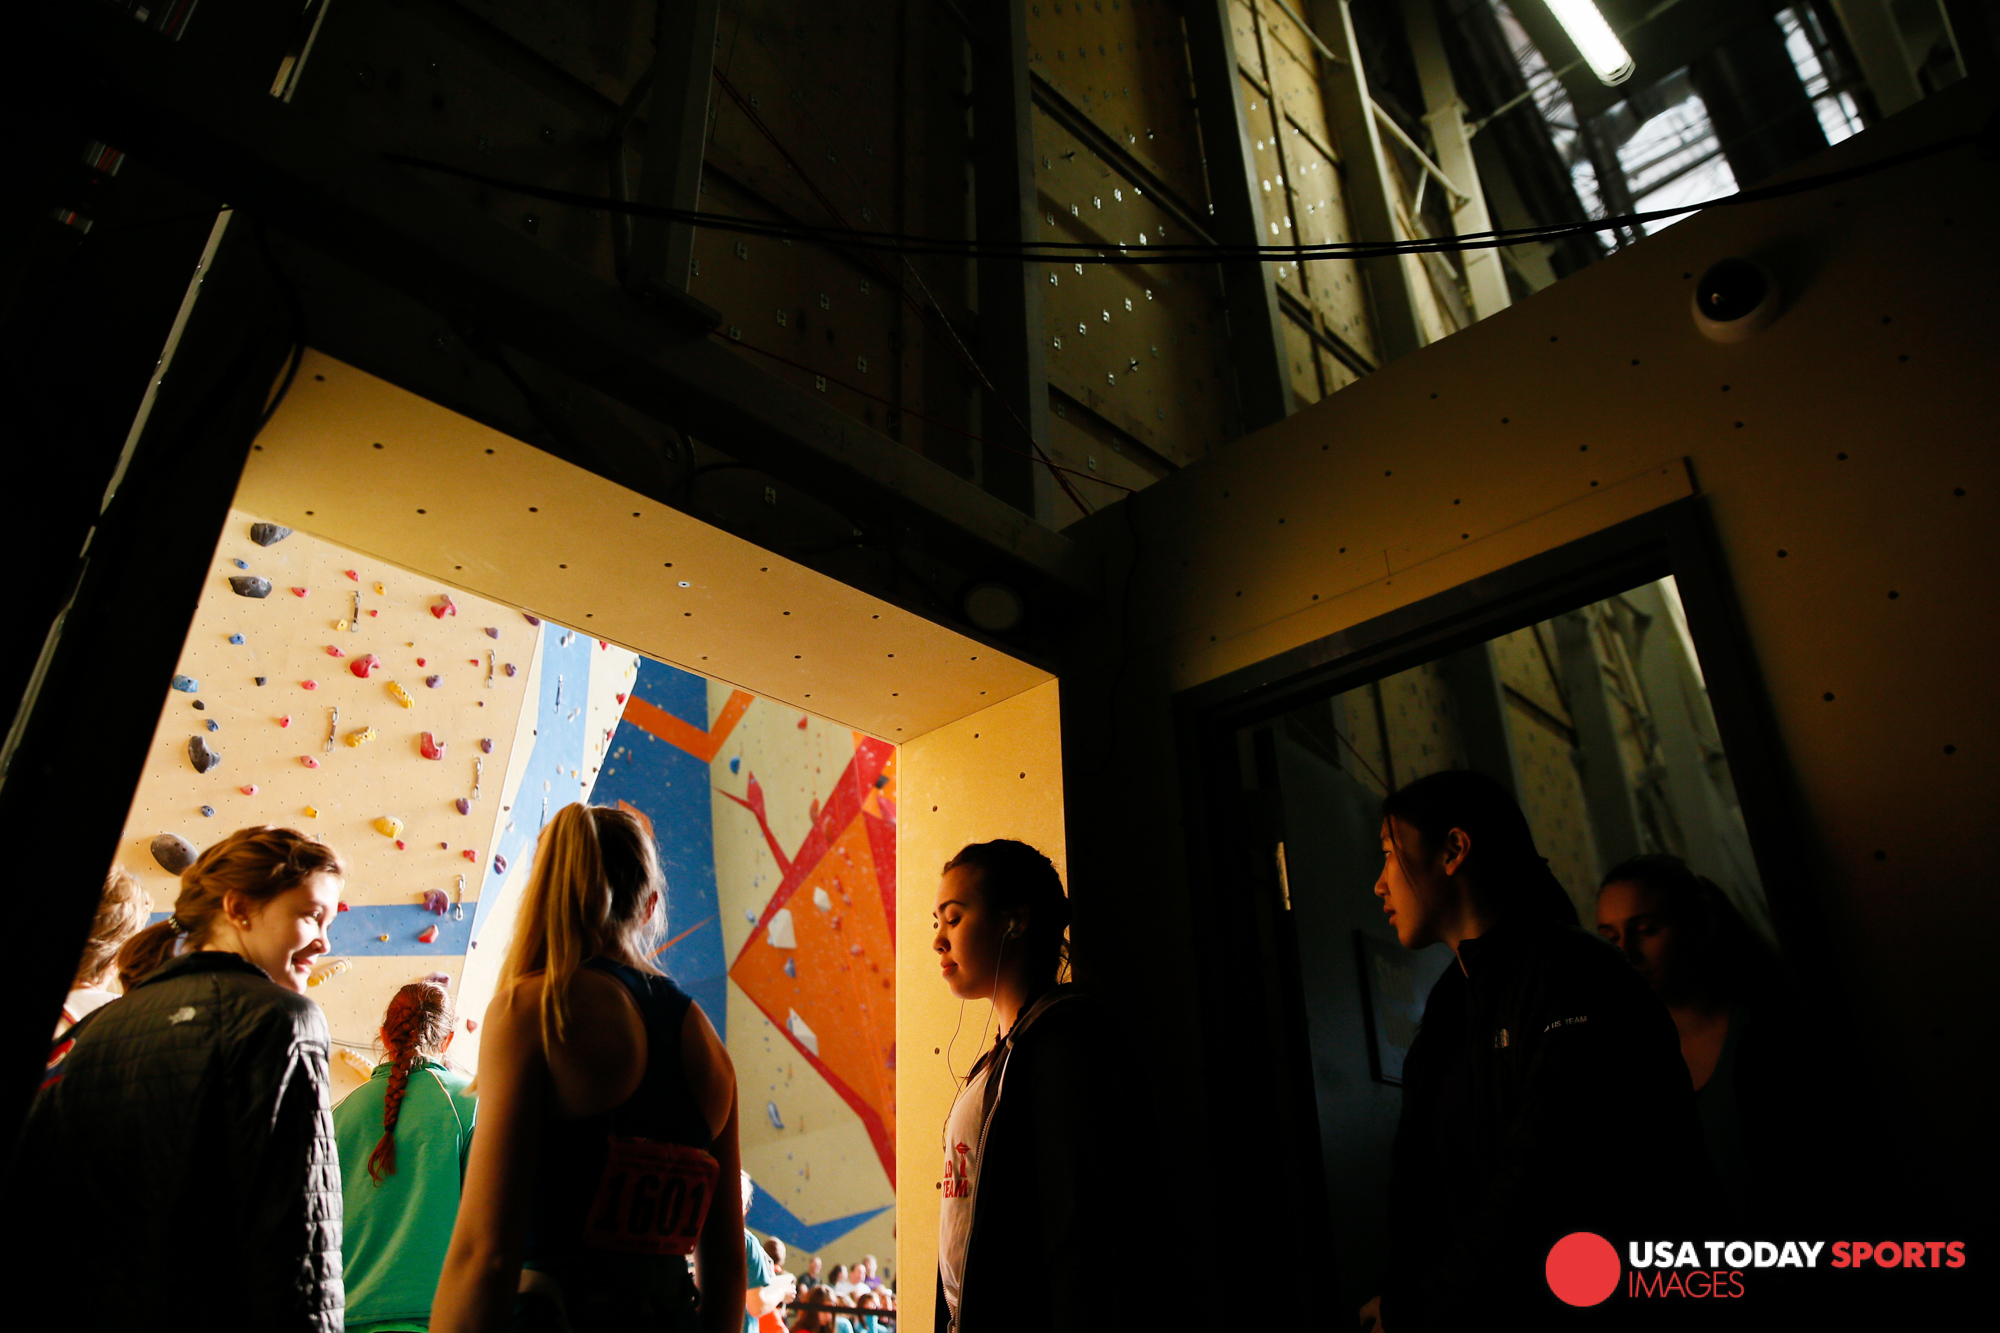 Garrett_Reid_atlanta_advertising_commercial_photographer_sport_and_speed_youth_national_chap_climbing-8.jpg